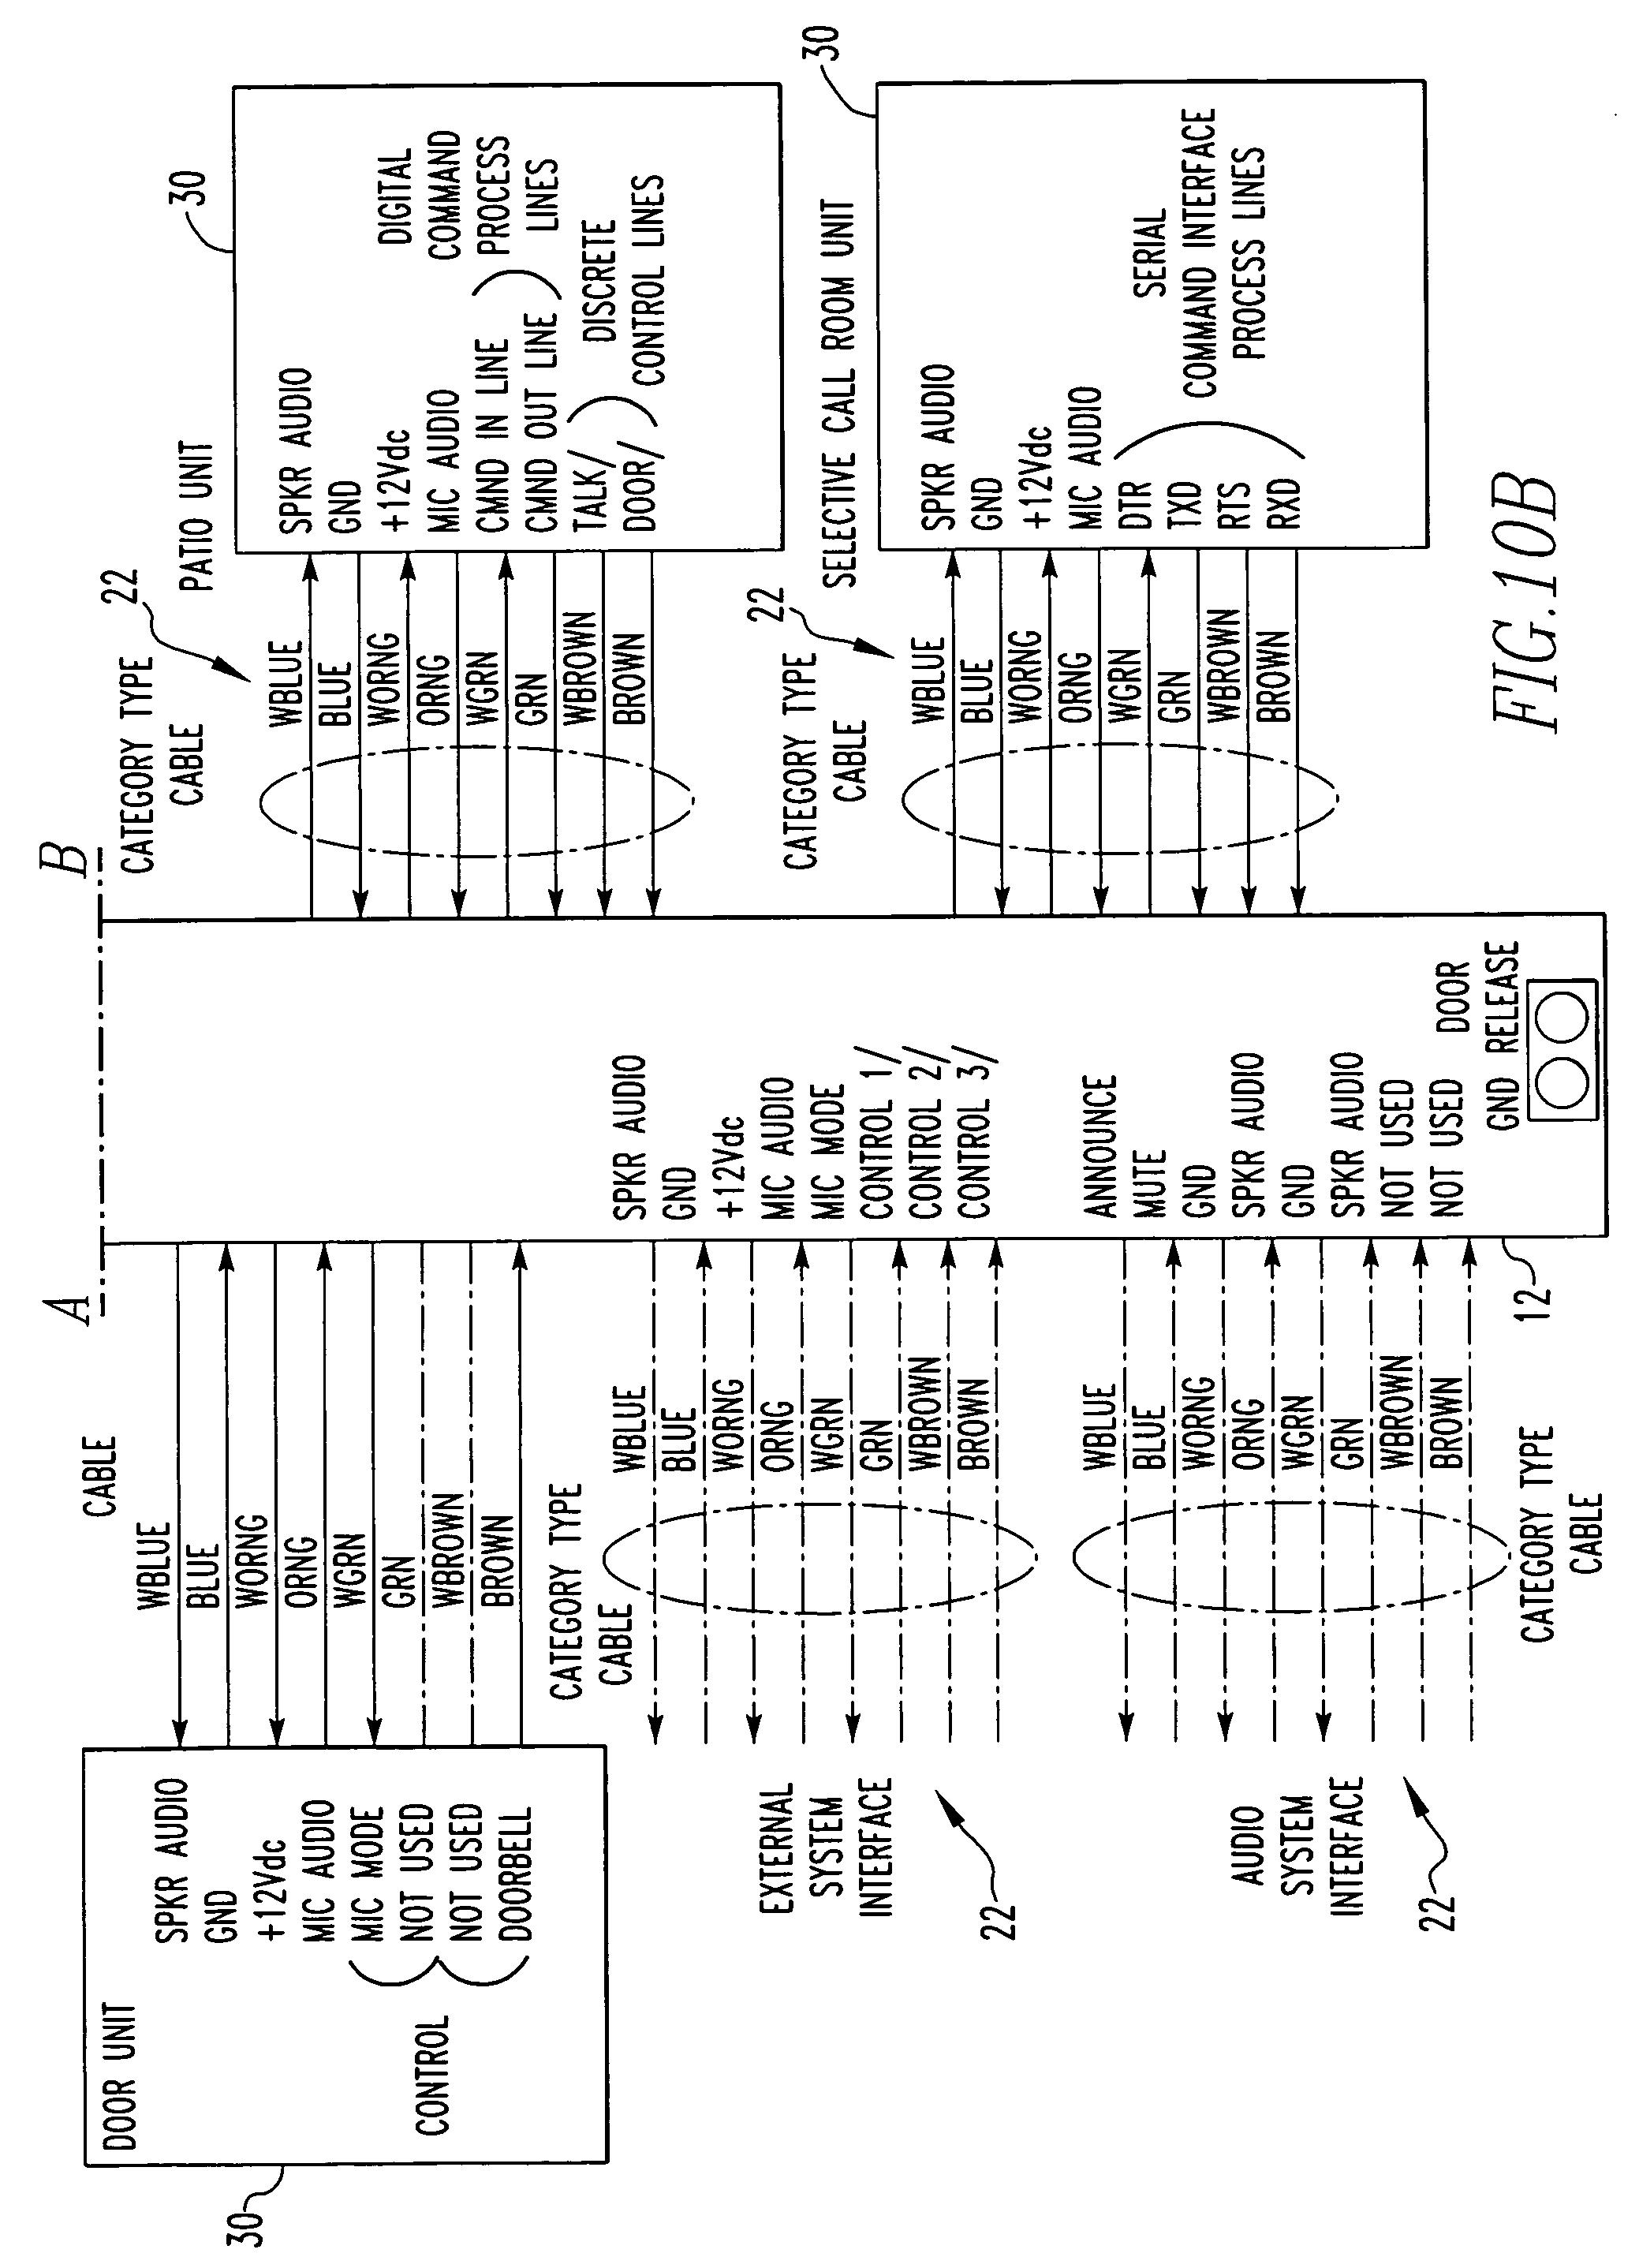 patent us7764775 distributed intercom system google patents patent drawing